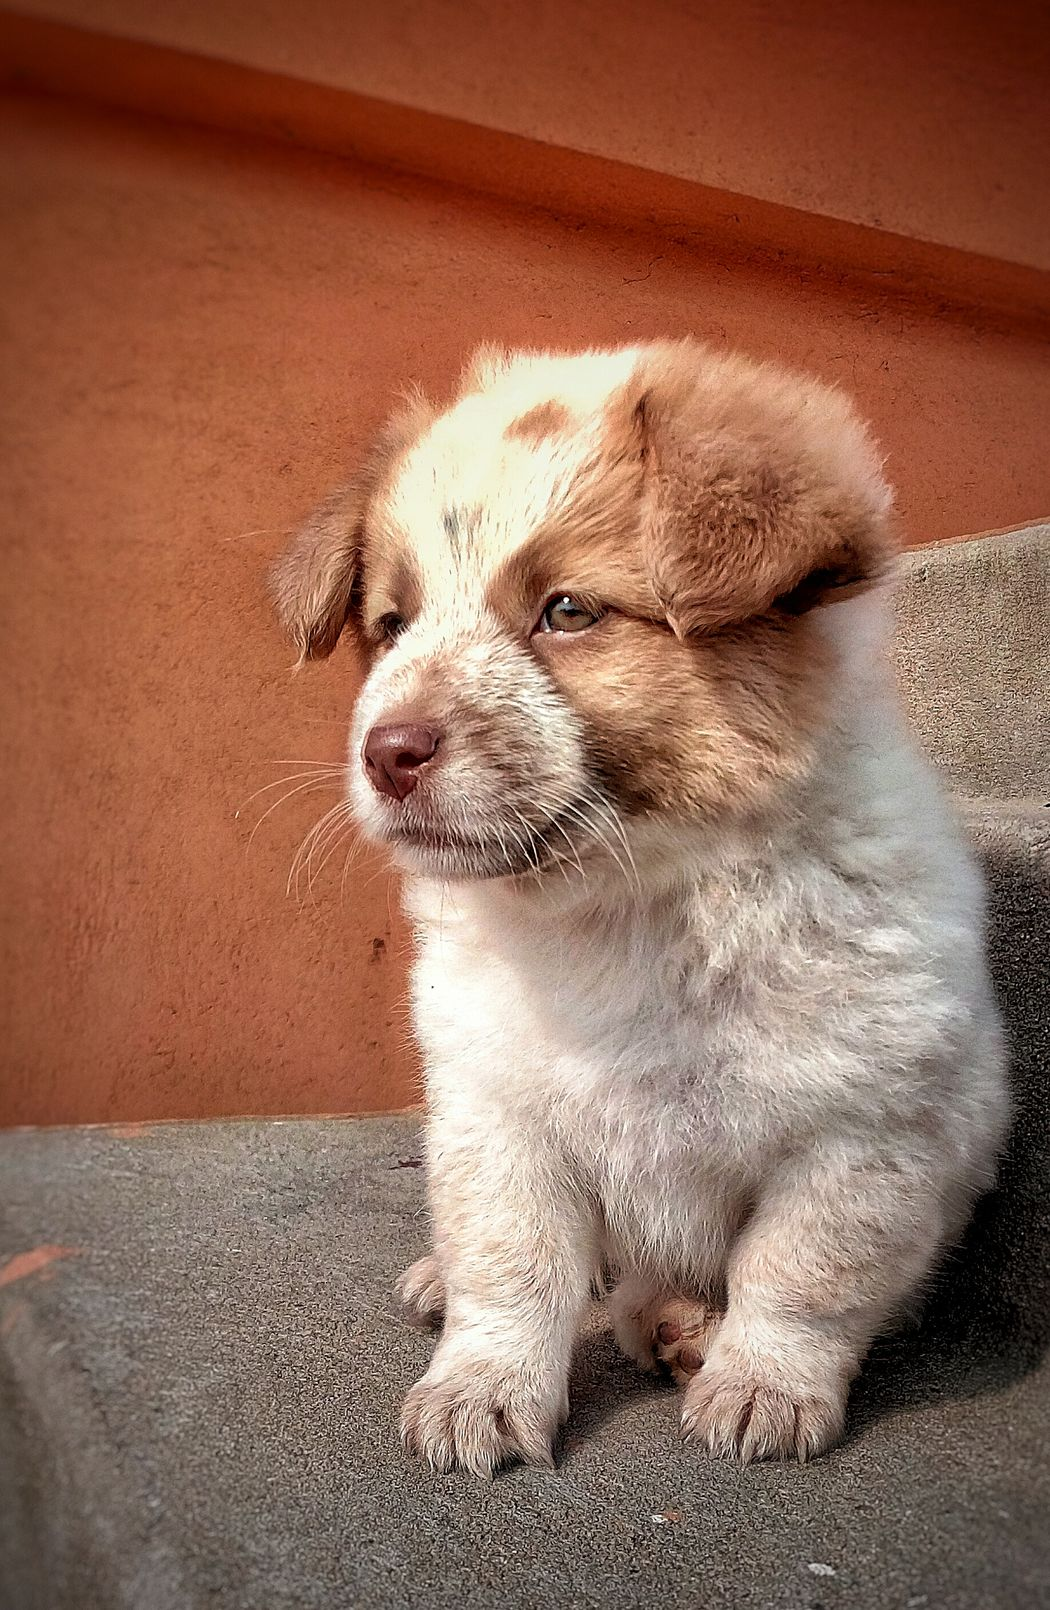 One Animal Mammal Pets Domestic Animals Dog Close-up First Eyeem Photo